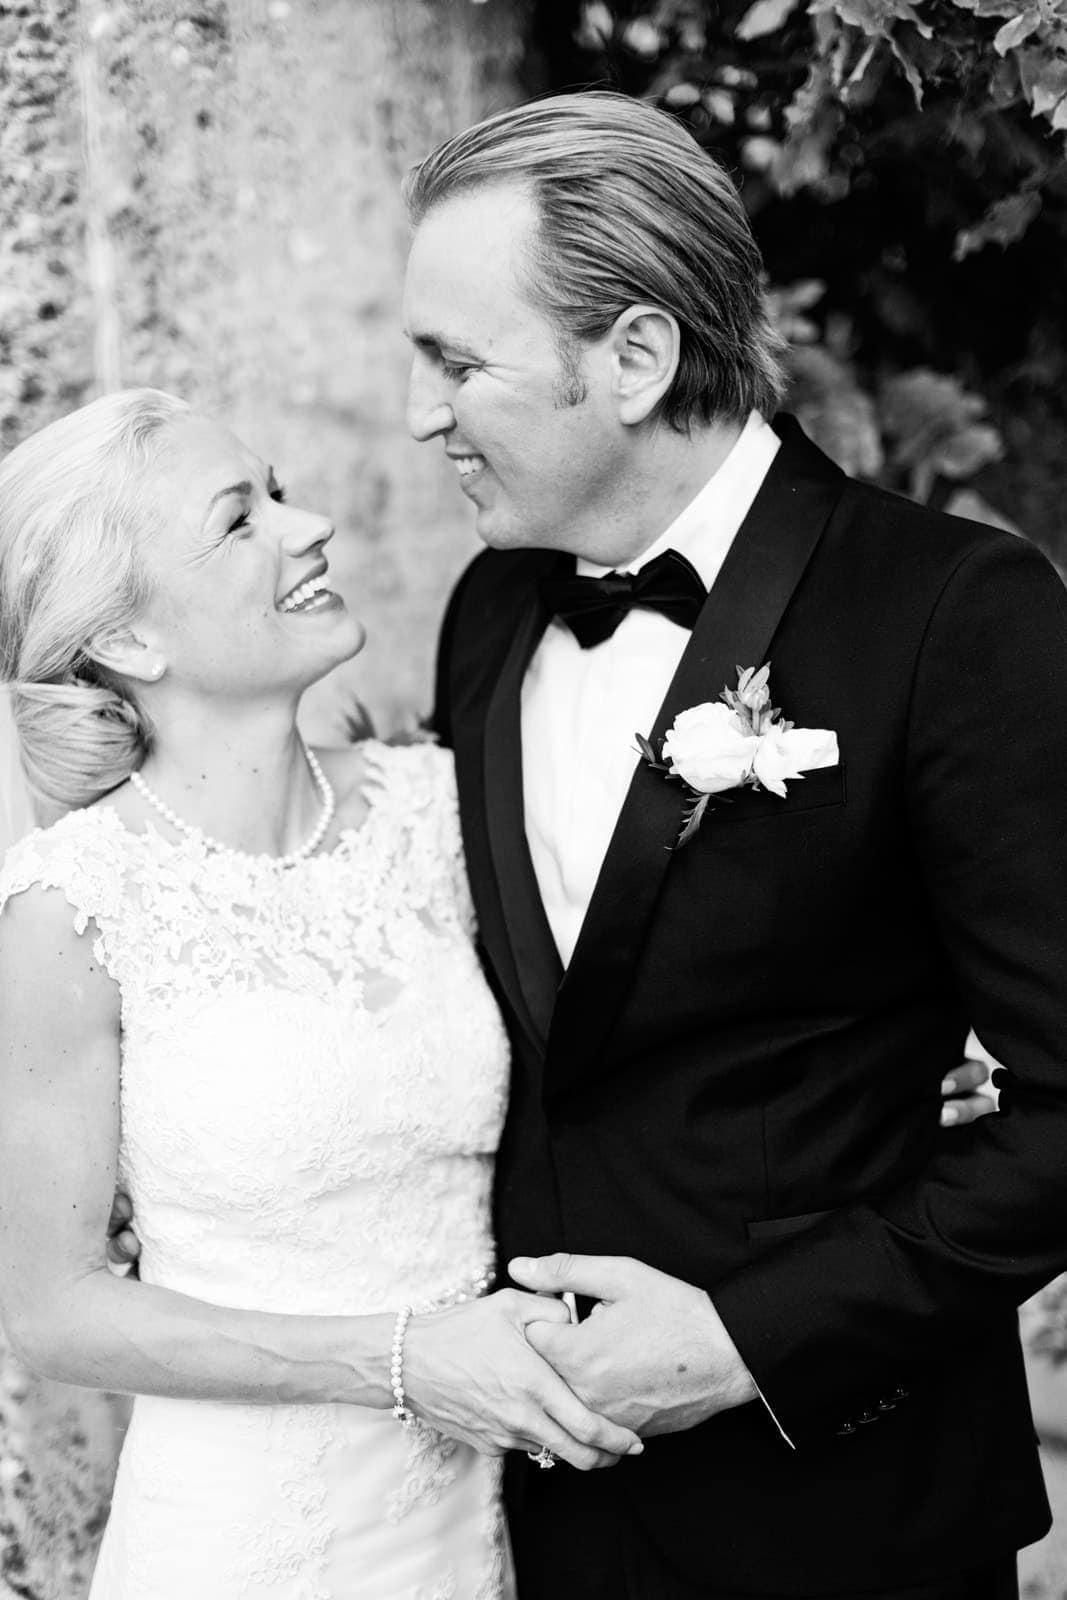 Brudepar ved Islands Brygge – del 2